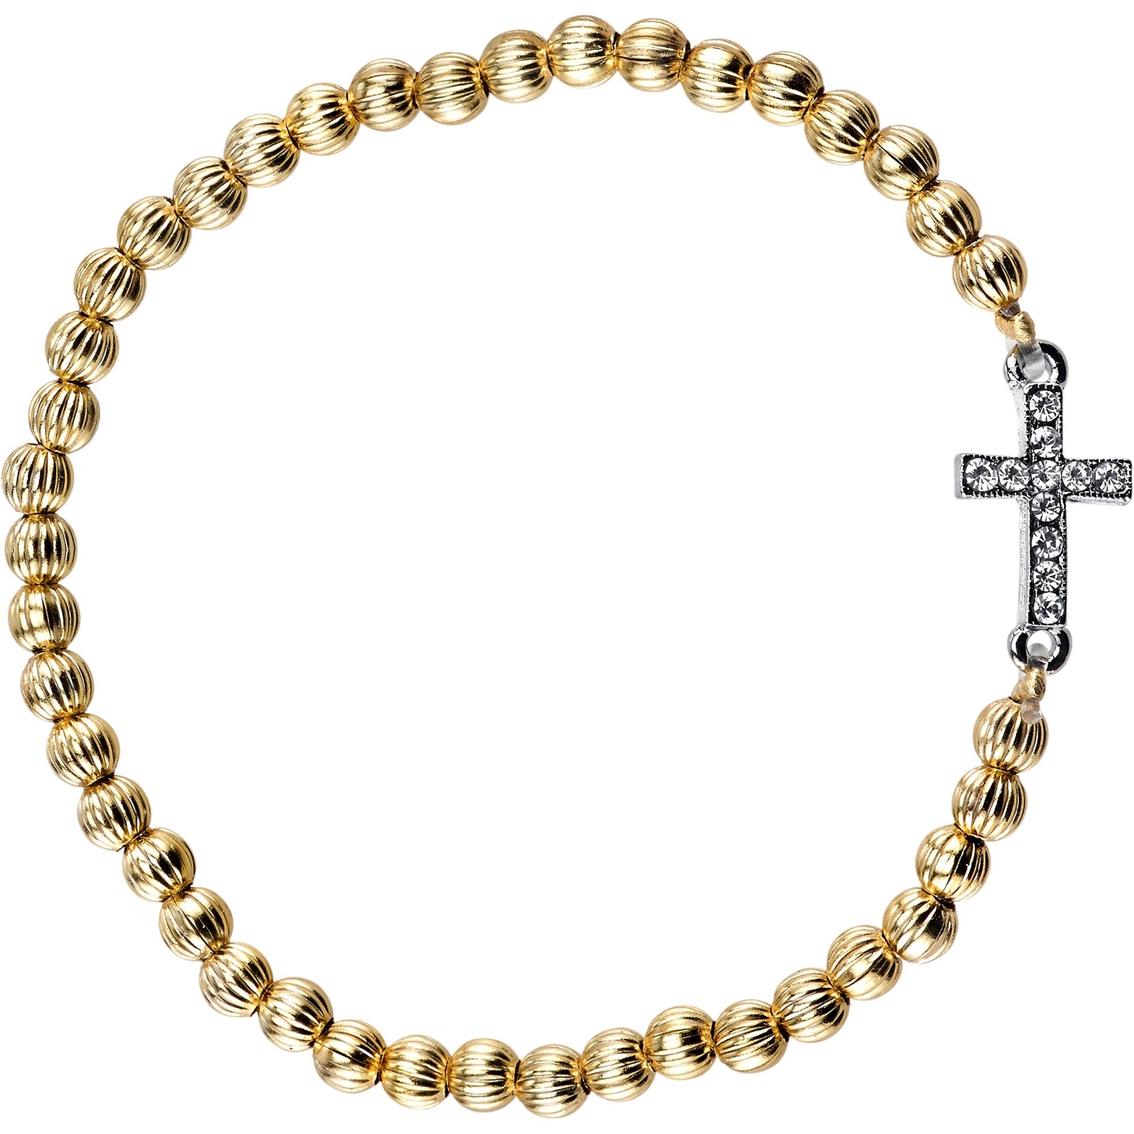 Symbols of faith crystal sideways cross beaded stretch bracelet symbols of faith crystal sideways cross beaded stretch bracelet biocorpaavc Images